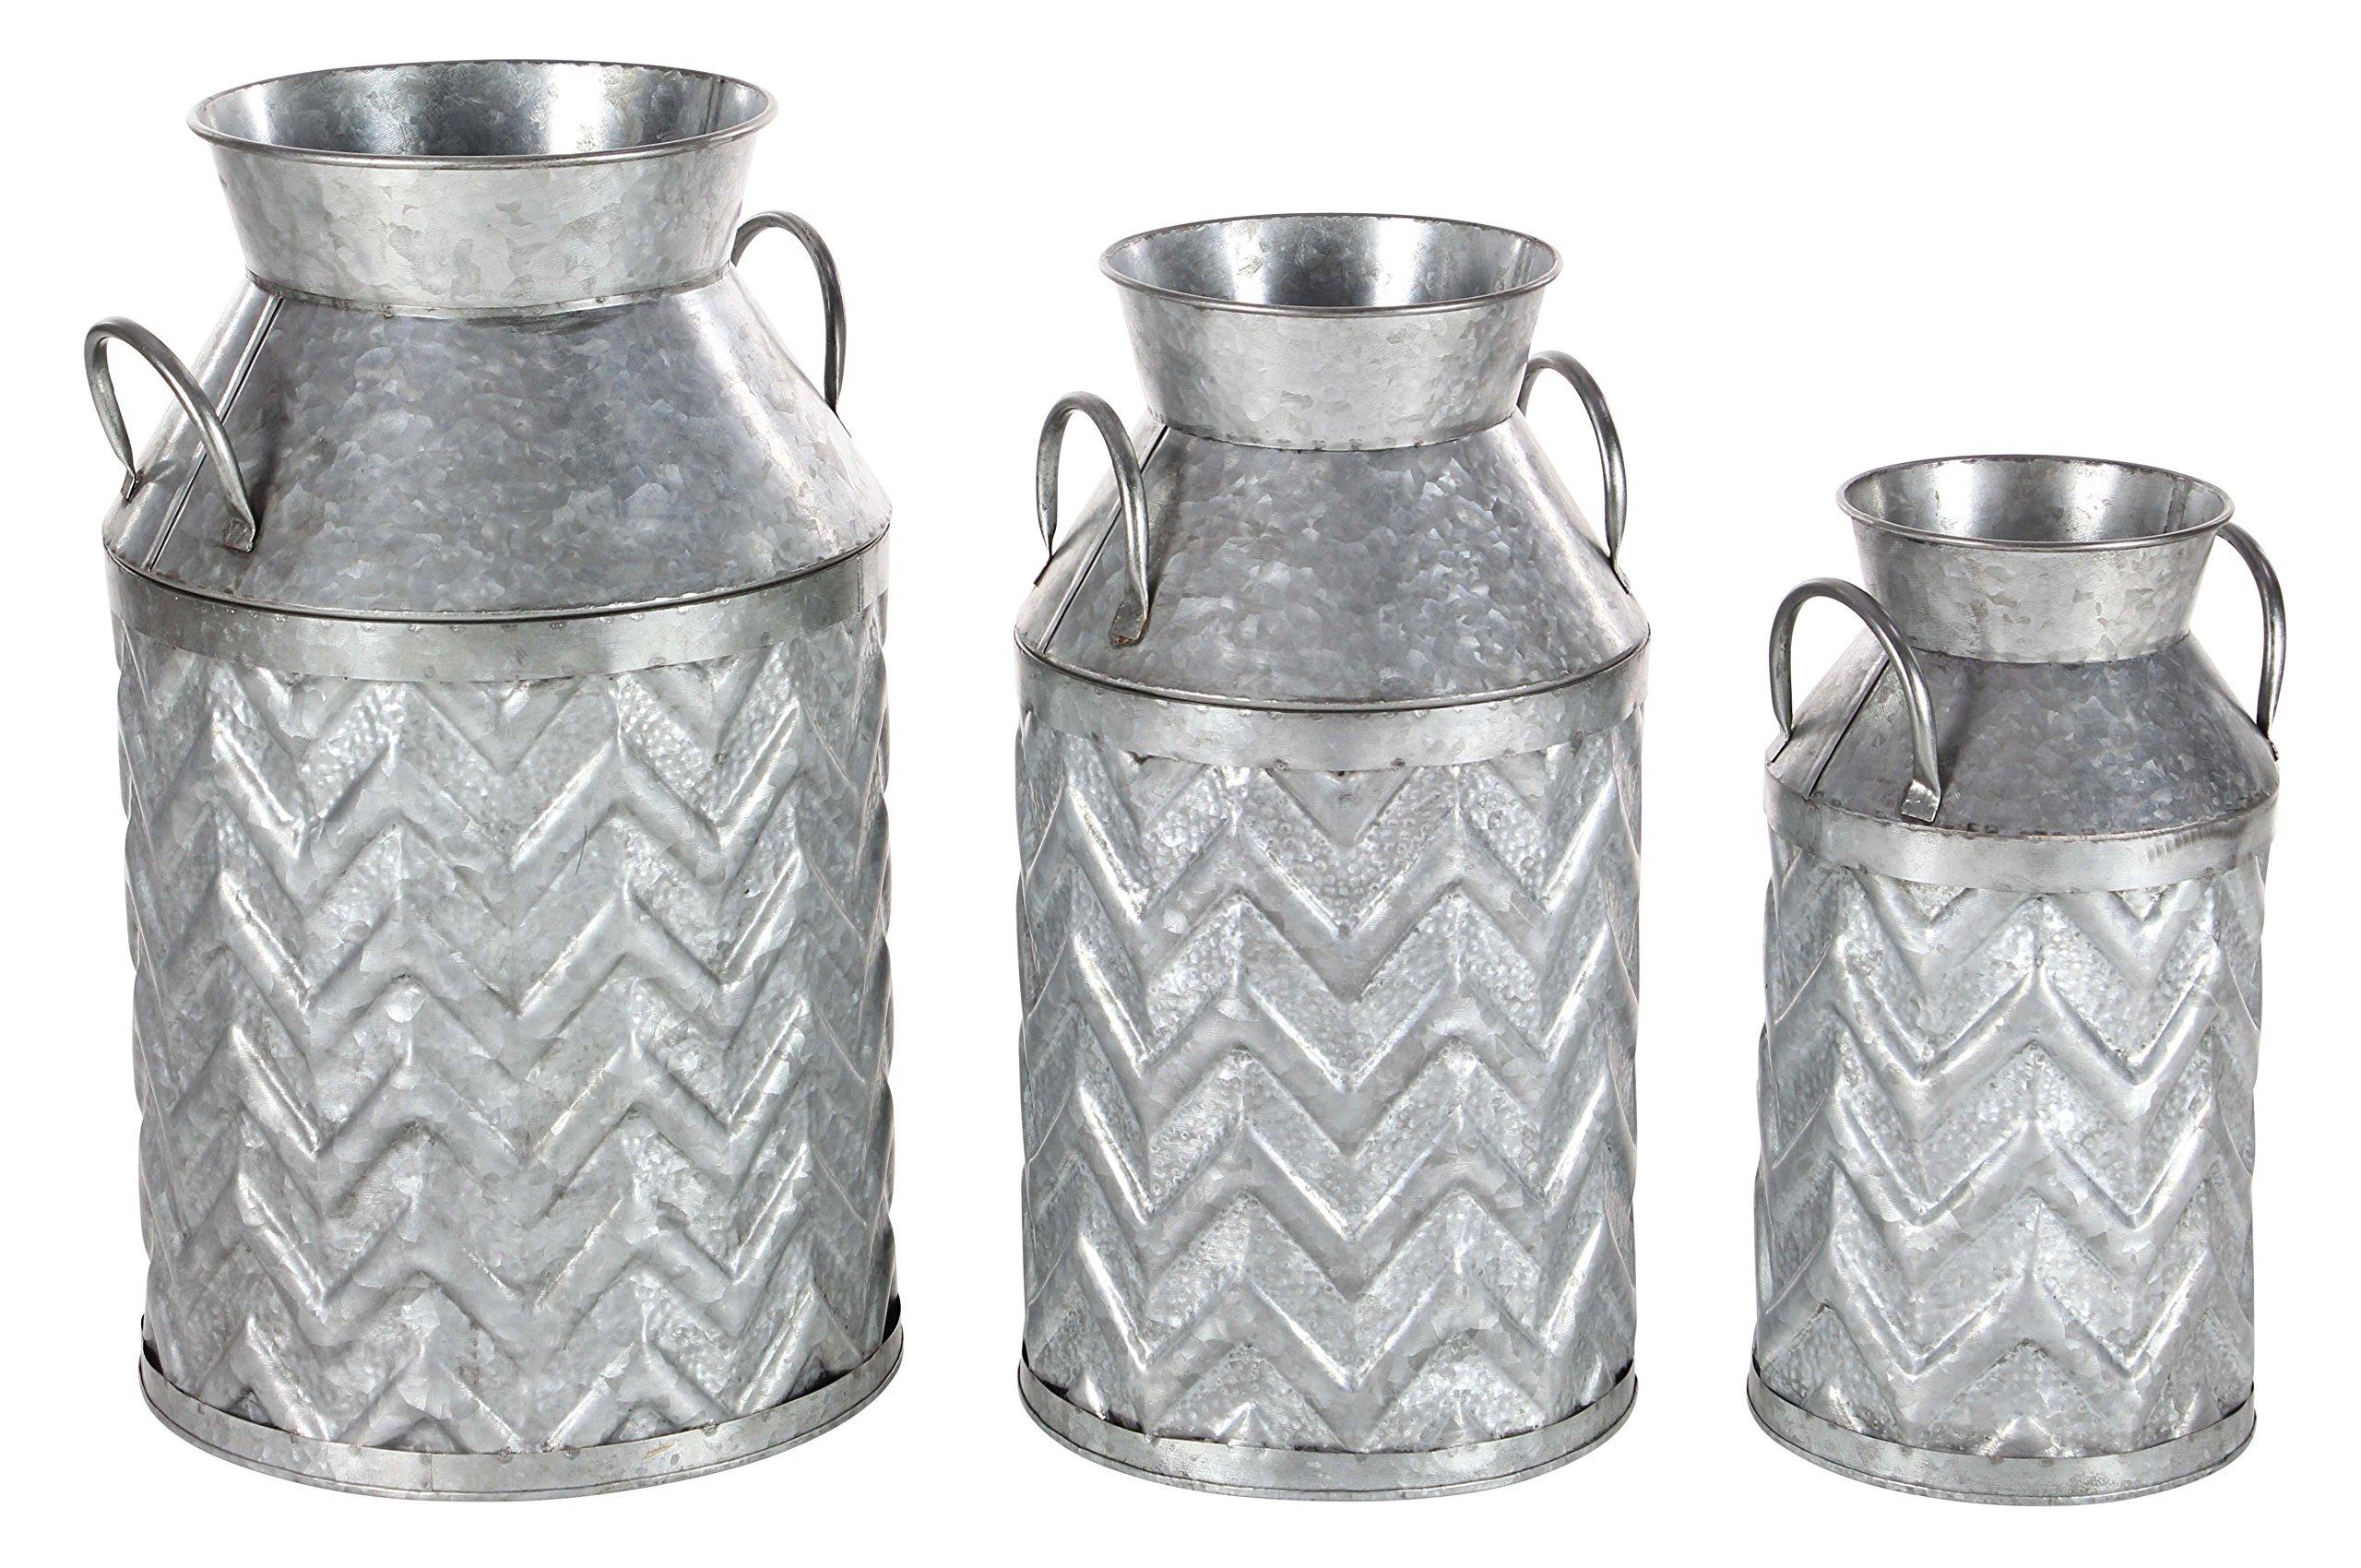 Deco 79 98146 Decorative Iron Milk Jugs (Set of 3), 13'' x 17'' x 18'', Gray by Deco 79